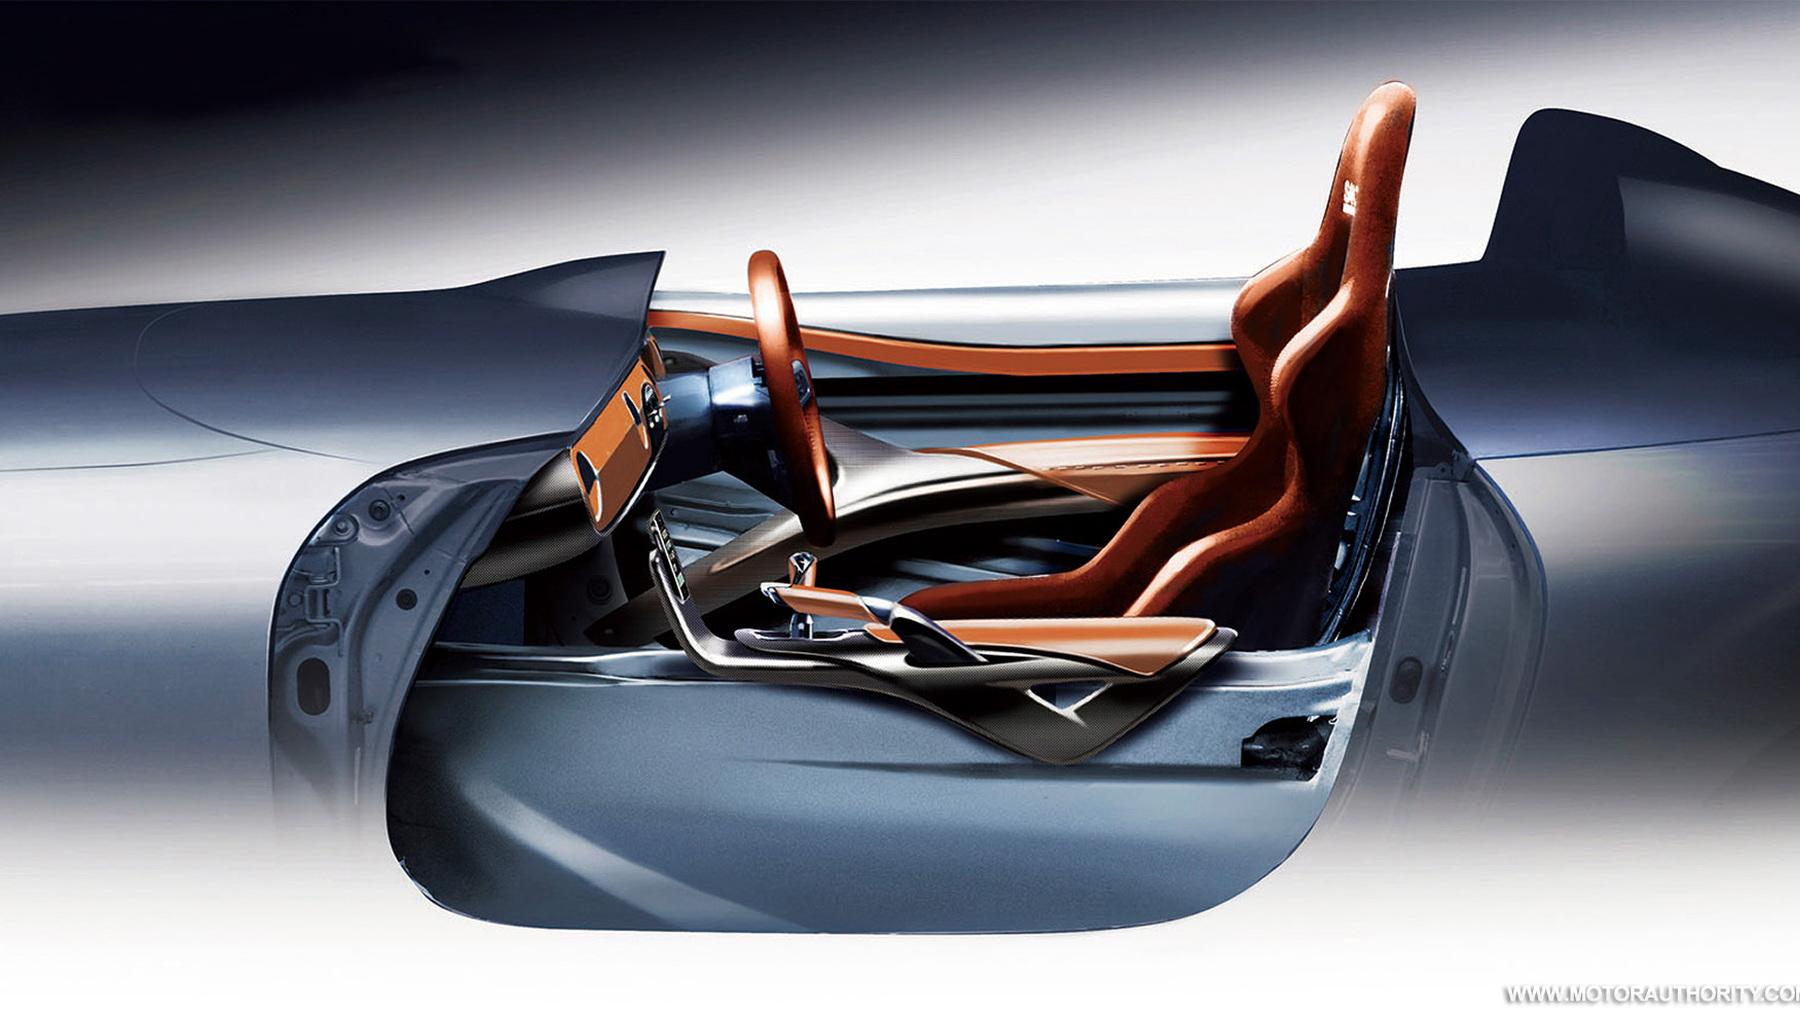 2009 mazda mx 5 superlight concept car 002